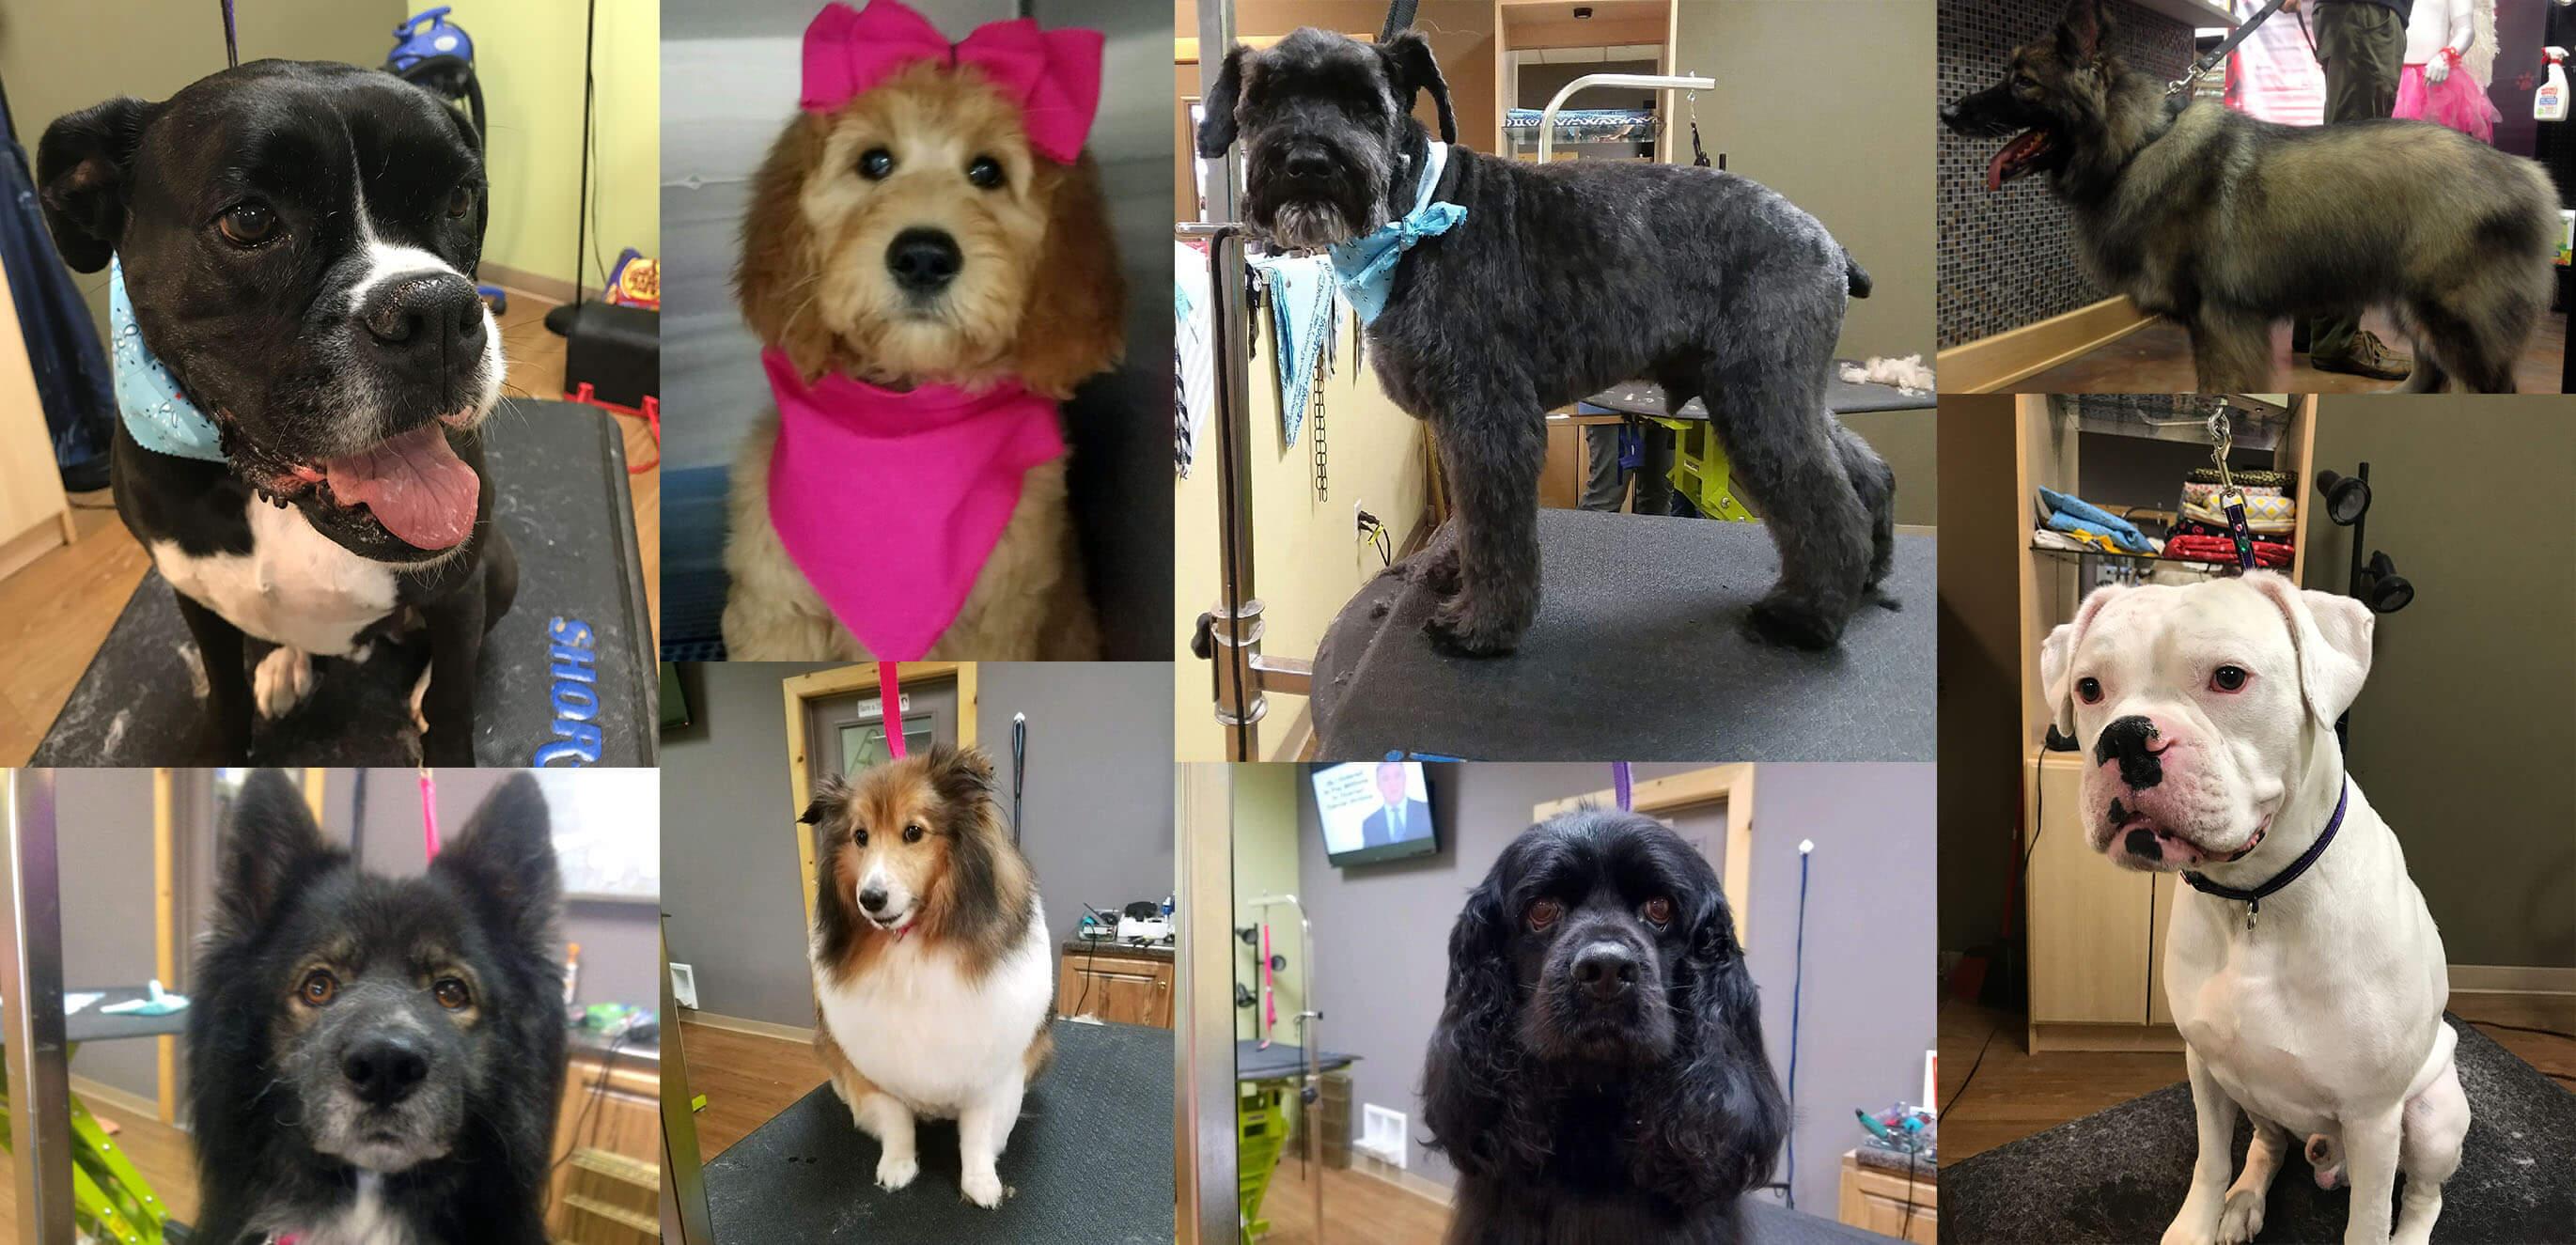 Pet Grooming Healthi Paws Valpo